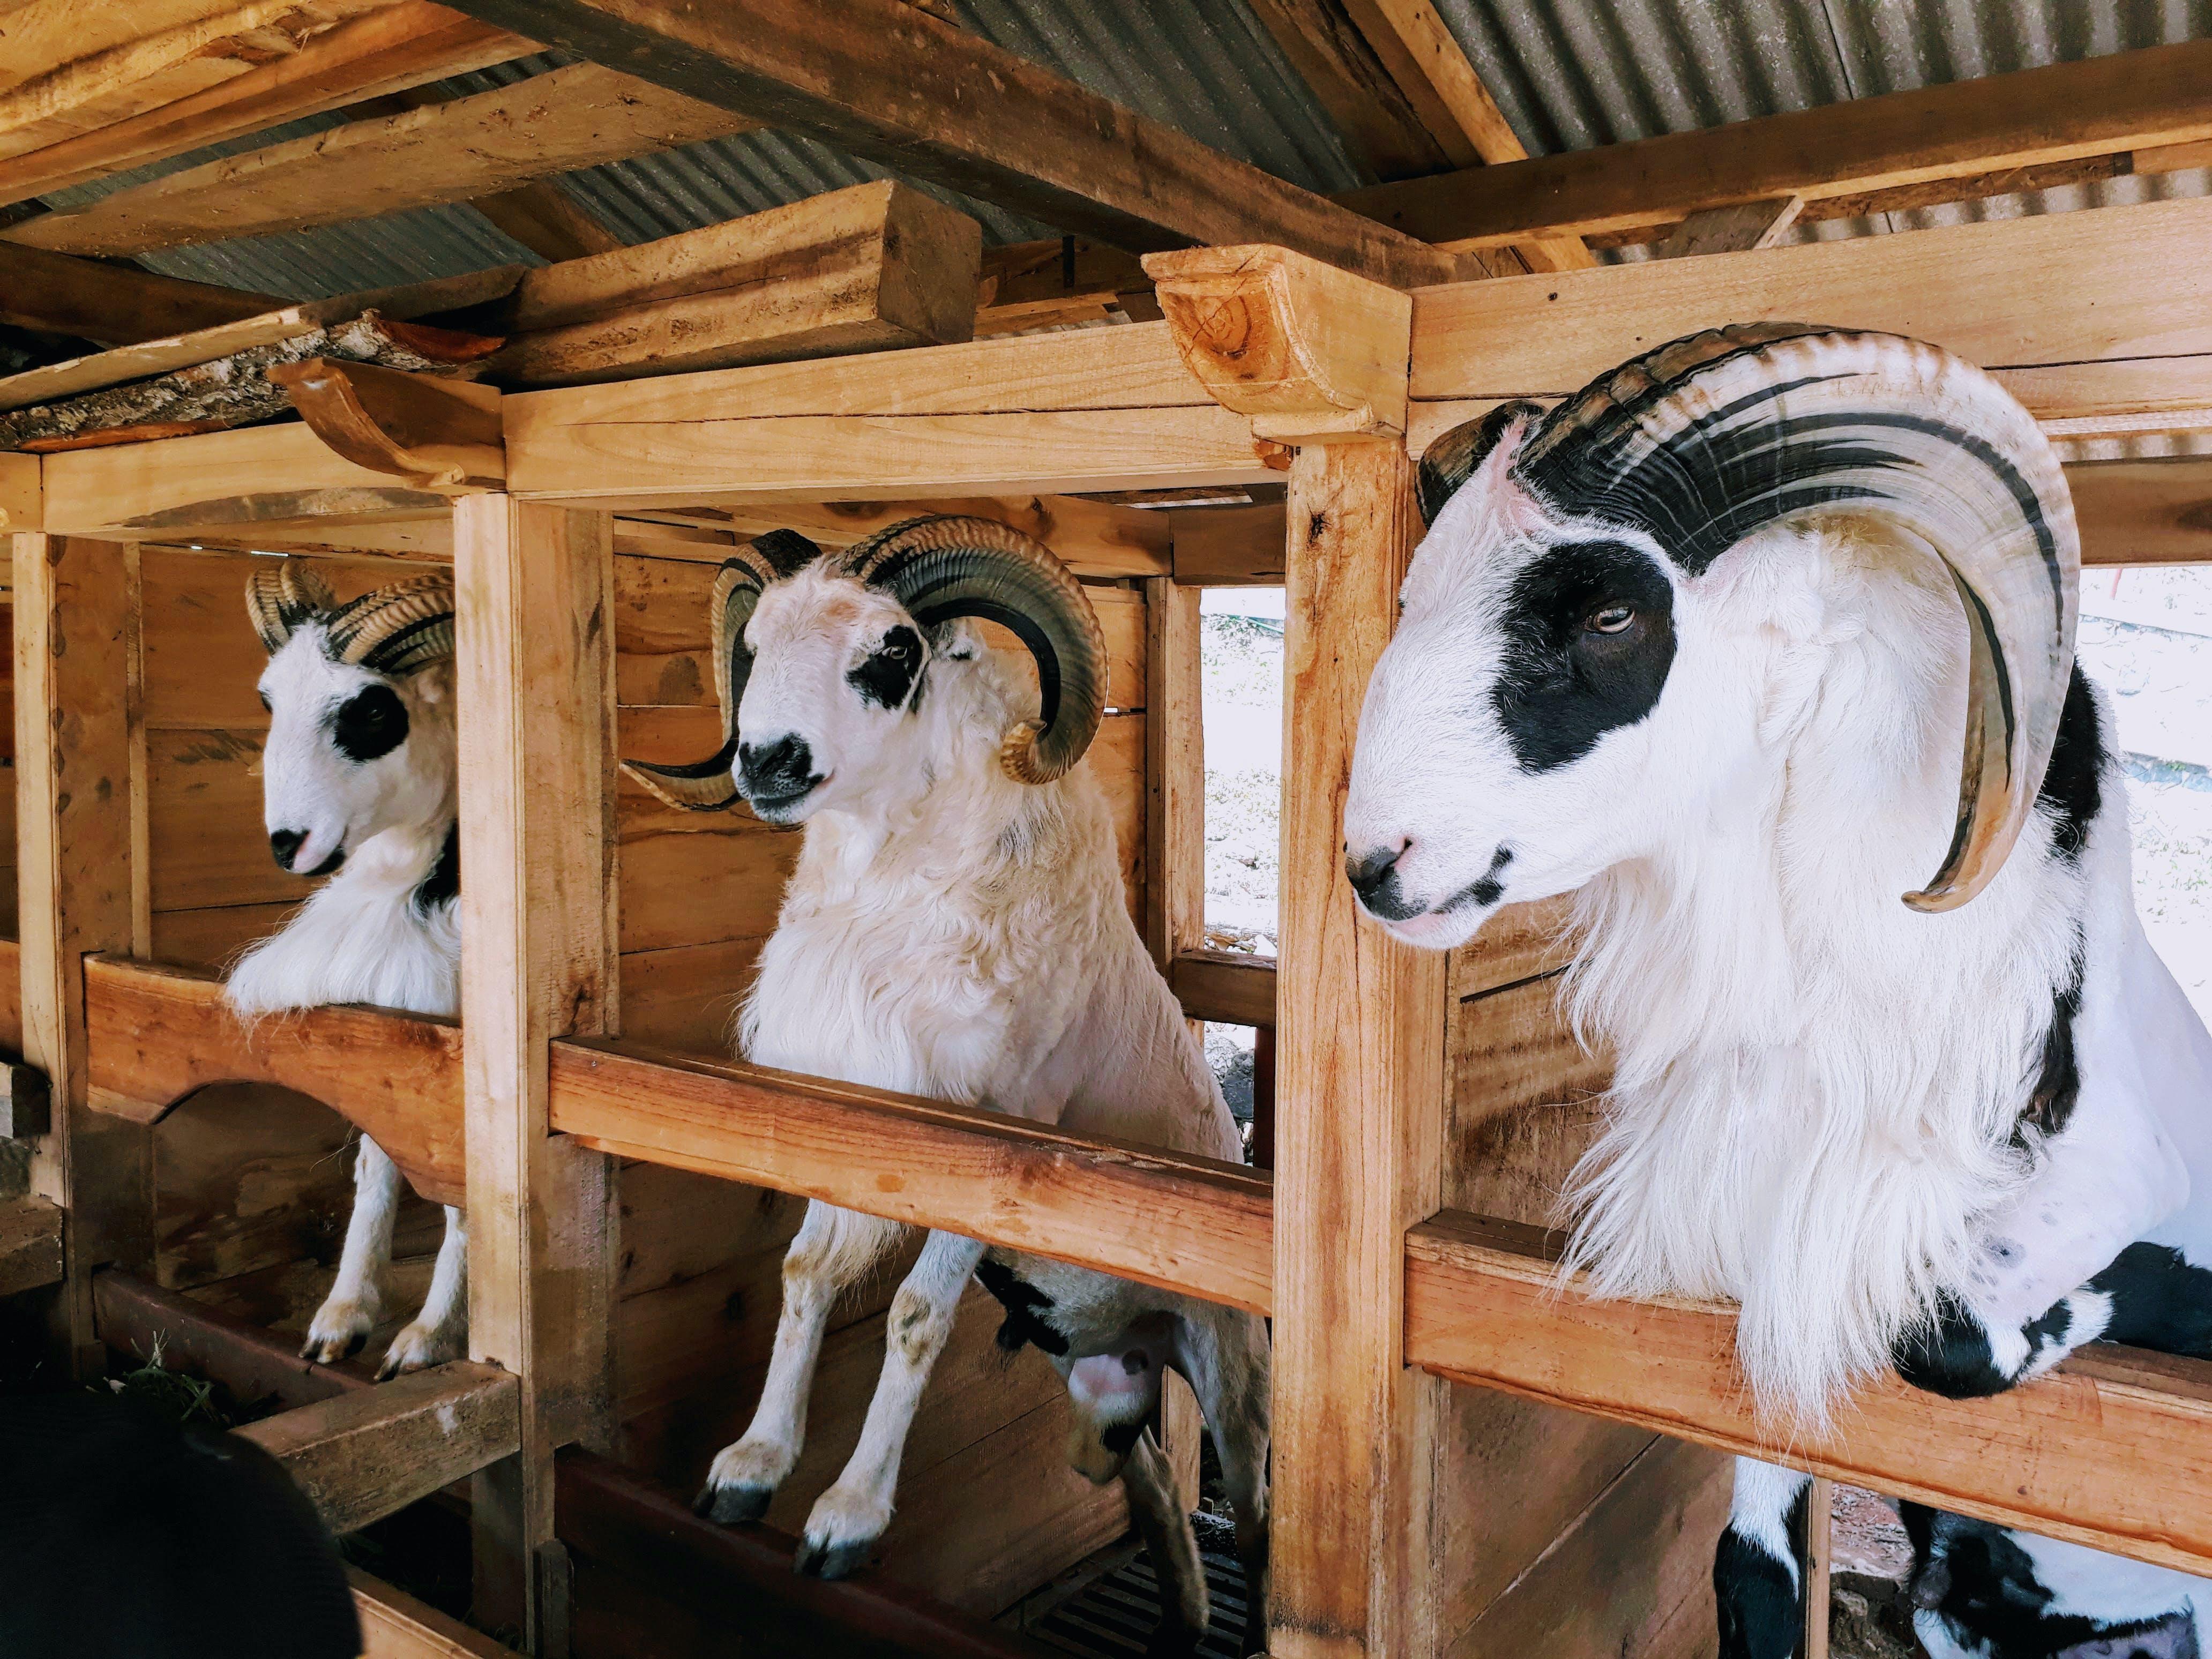 Základová fotografie zdarma na téma beranů, domba, farma, hospodářská zvířata